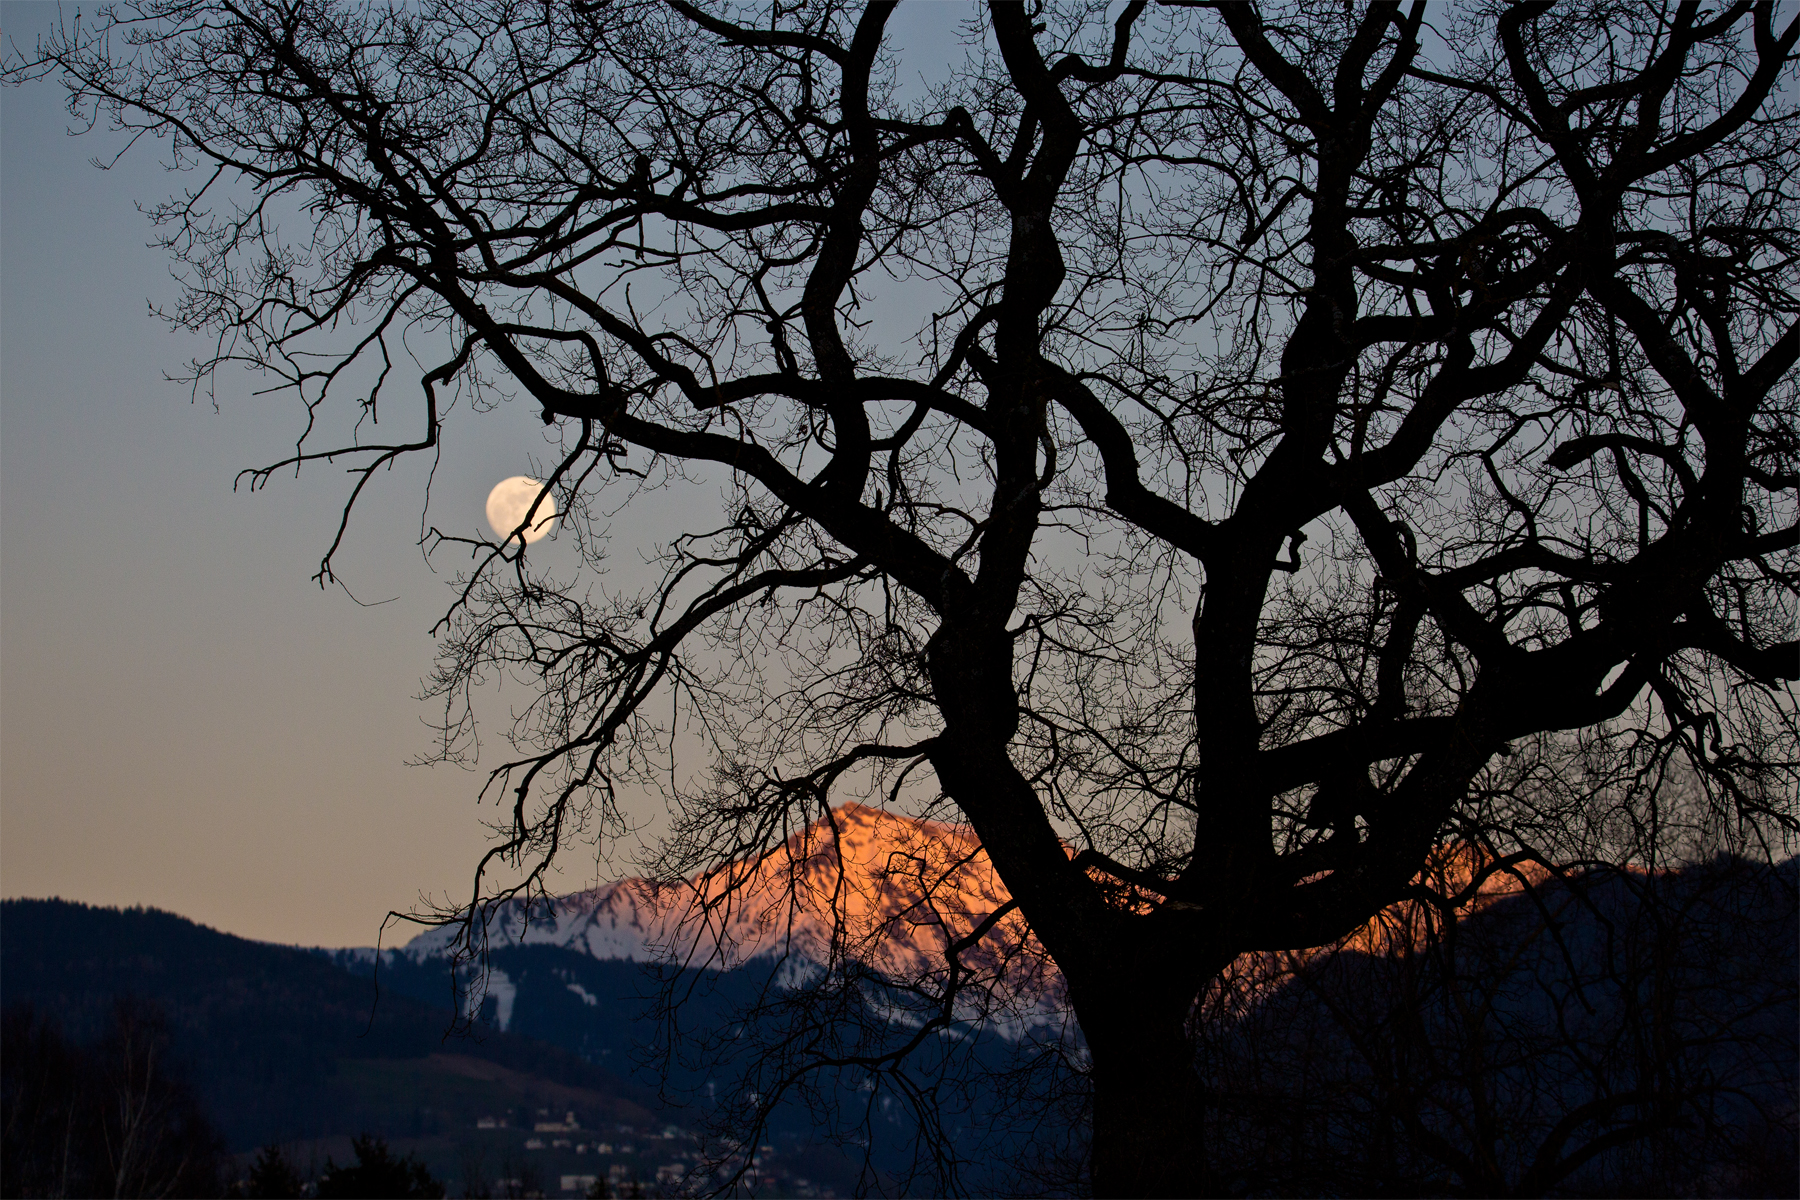 Gipfelleuchten hinterm Baum